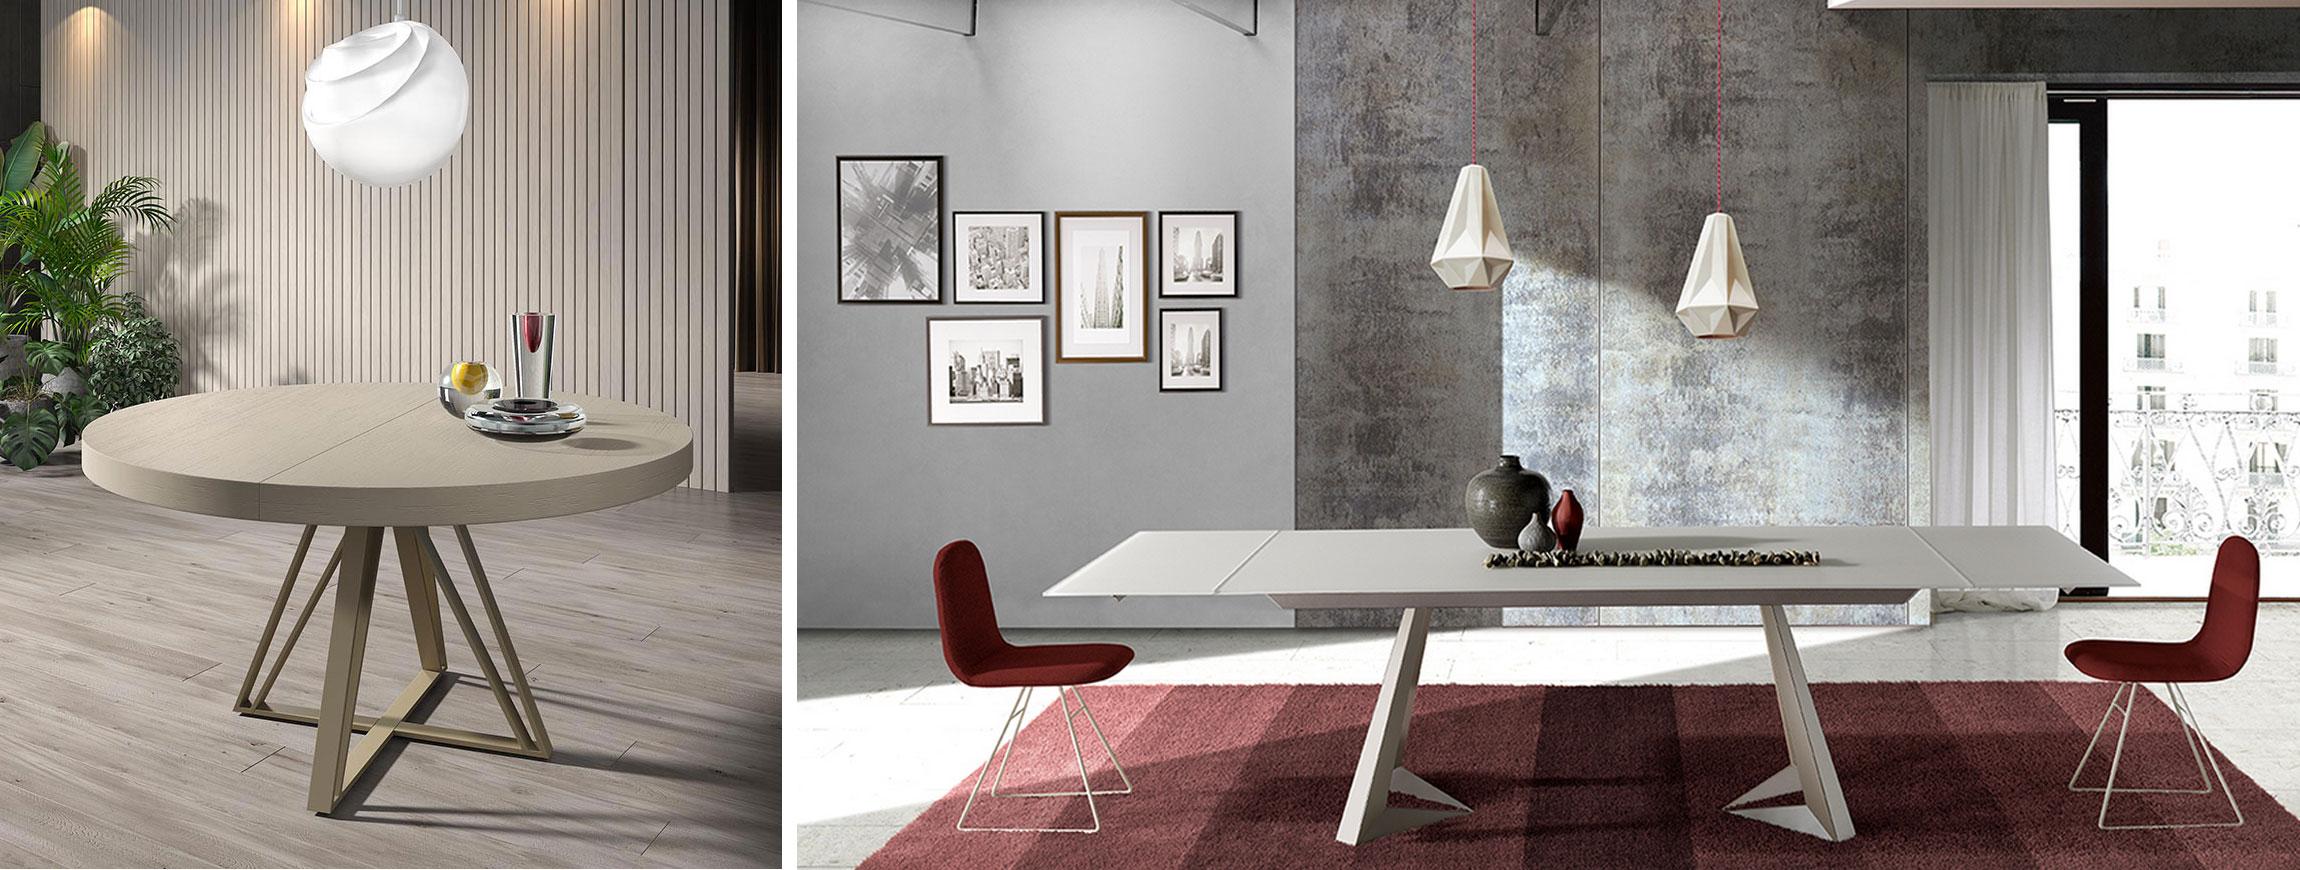 Mesas extensibles Muebles Toscana